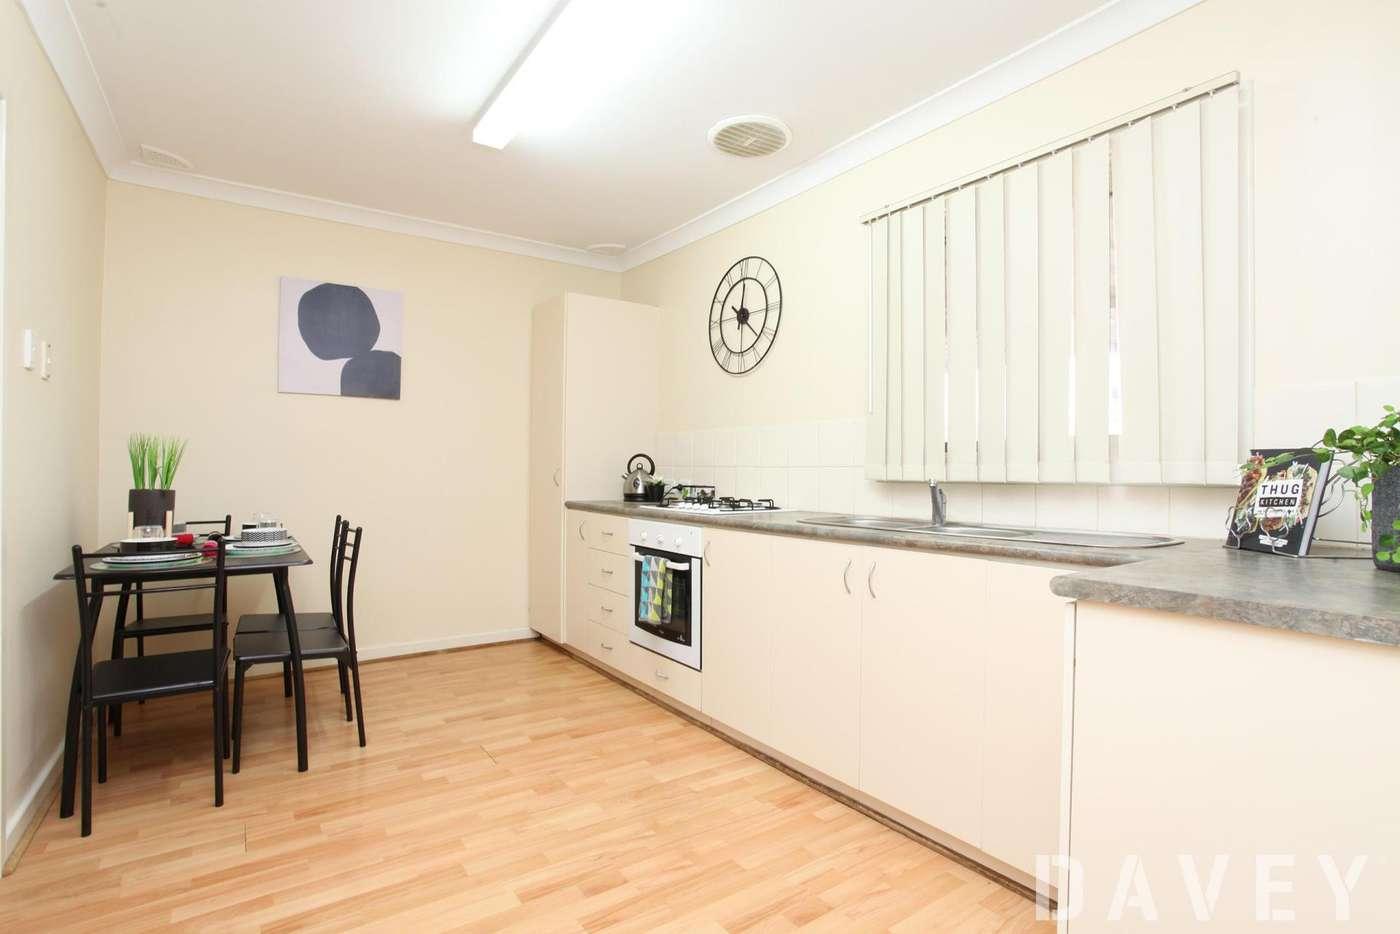 Main view of Homely house listing, 21/74 Amberton Avenue, Girrawheen WA 6064